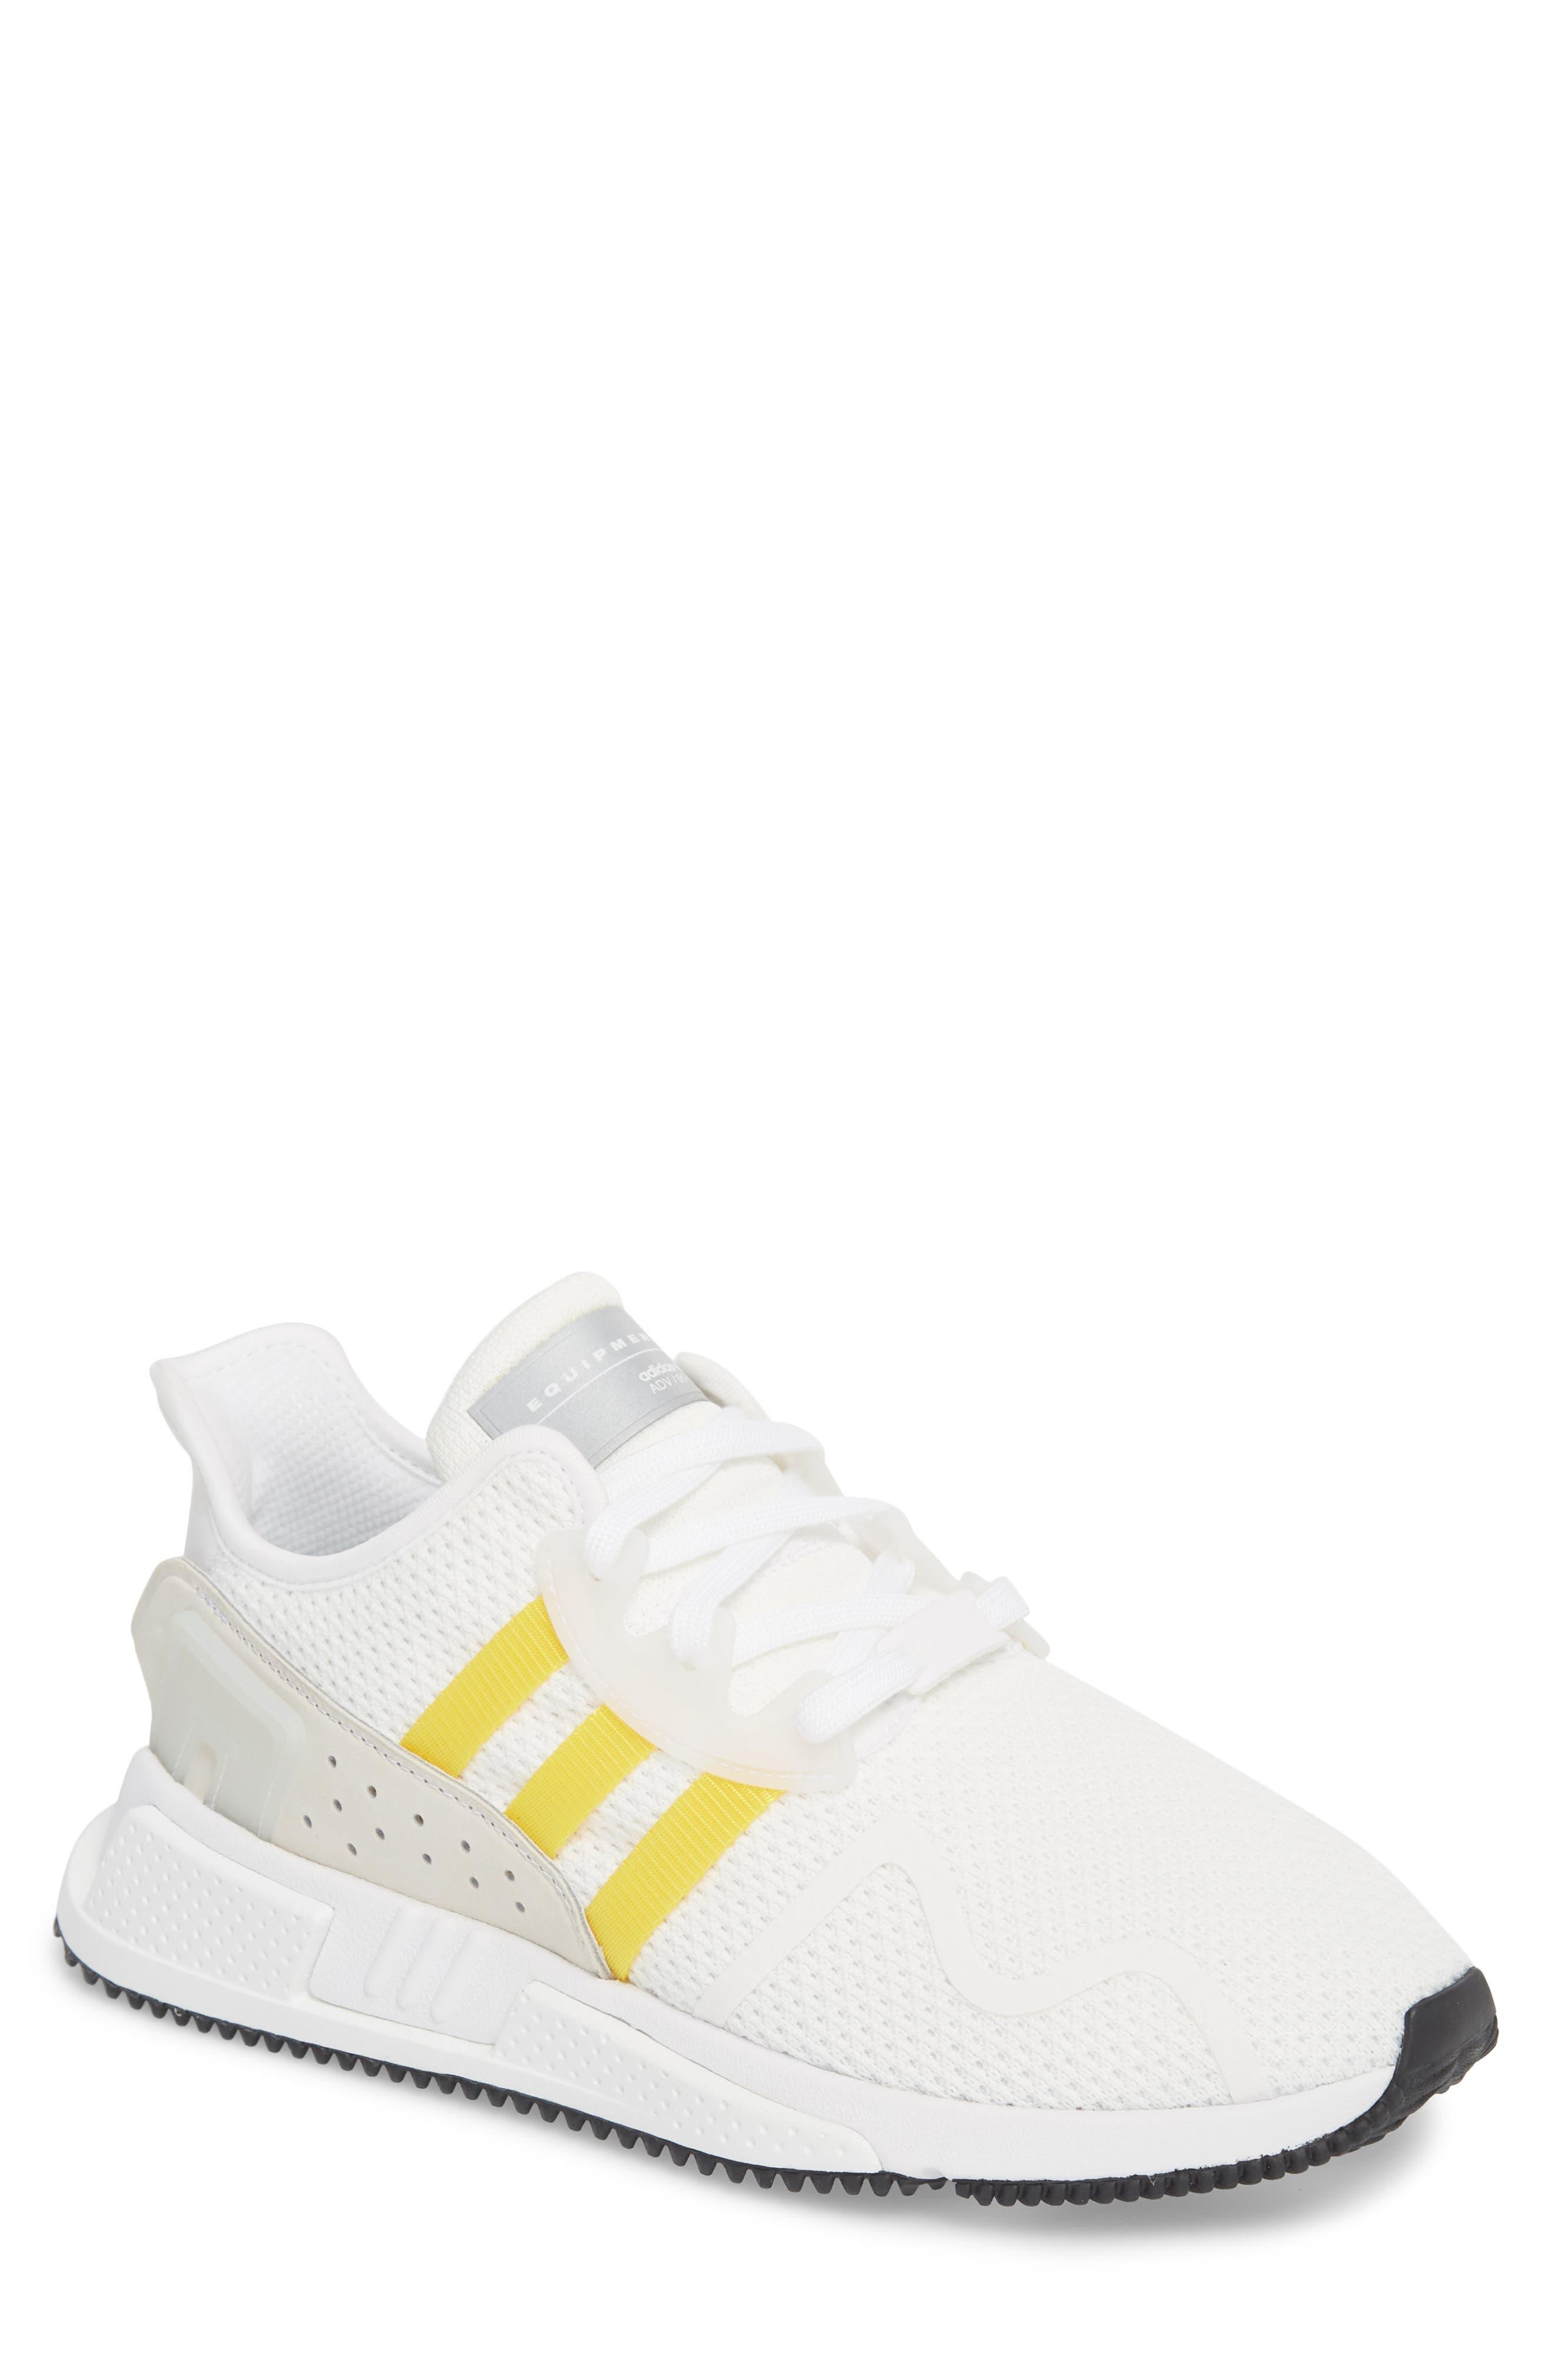 EQT Cushion ADV Sneaker,                         Main,                         color, 100